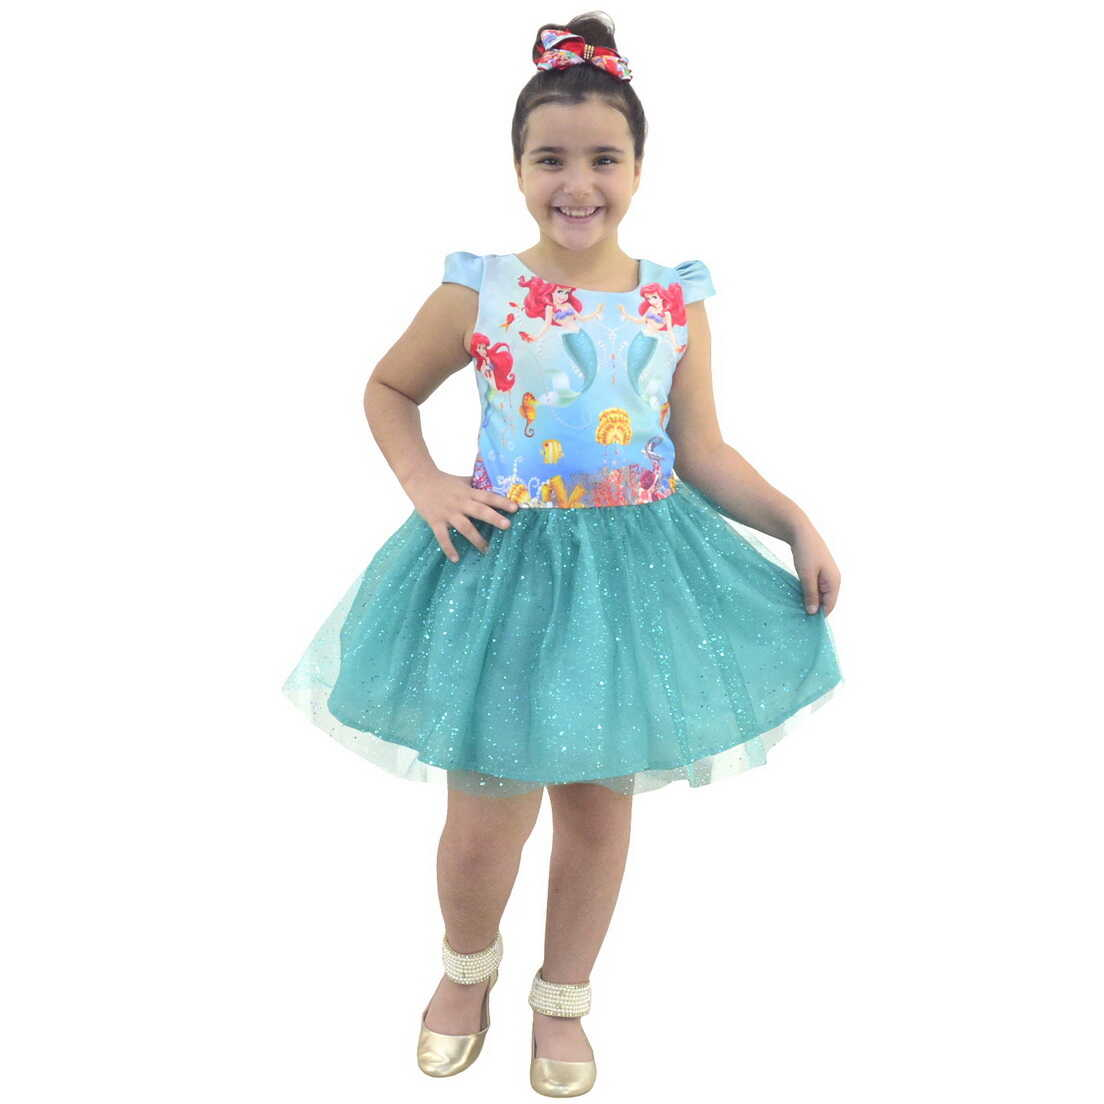 Vestido Ariel Pequena Sereia Saia Verde de Tule Com Glitter